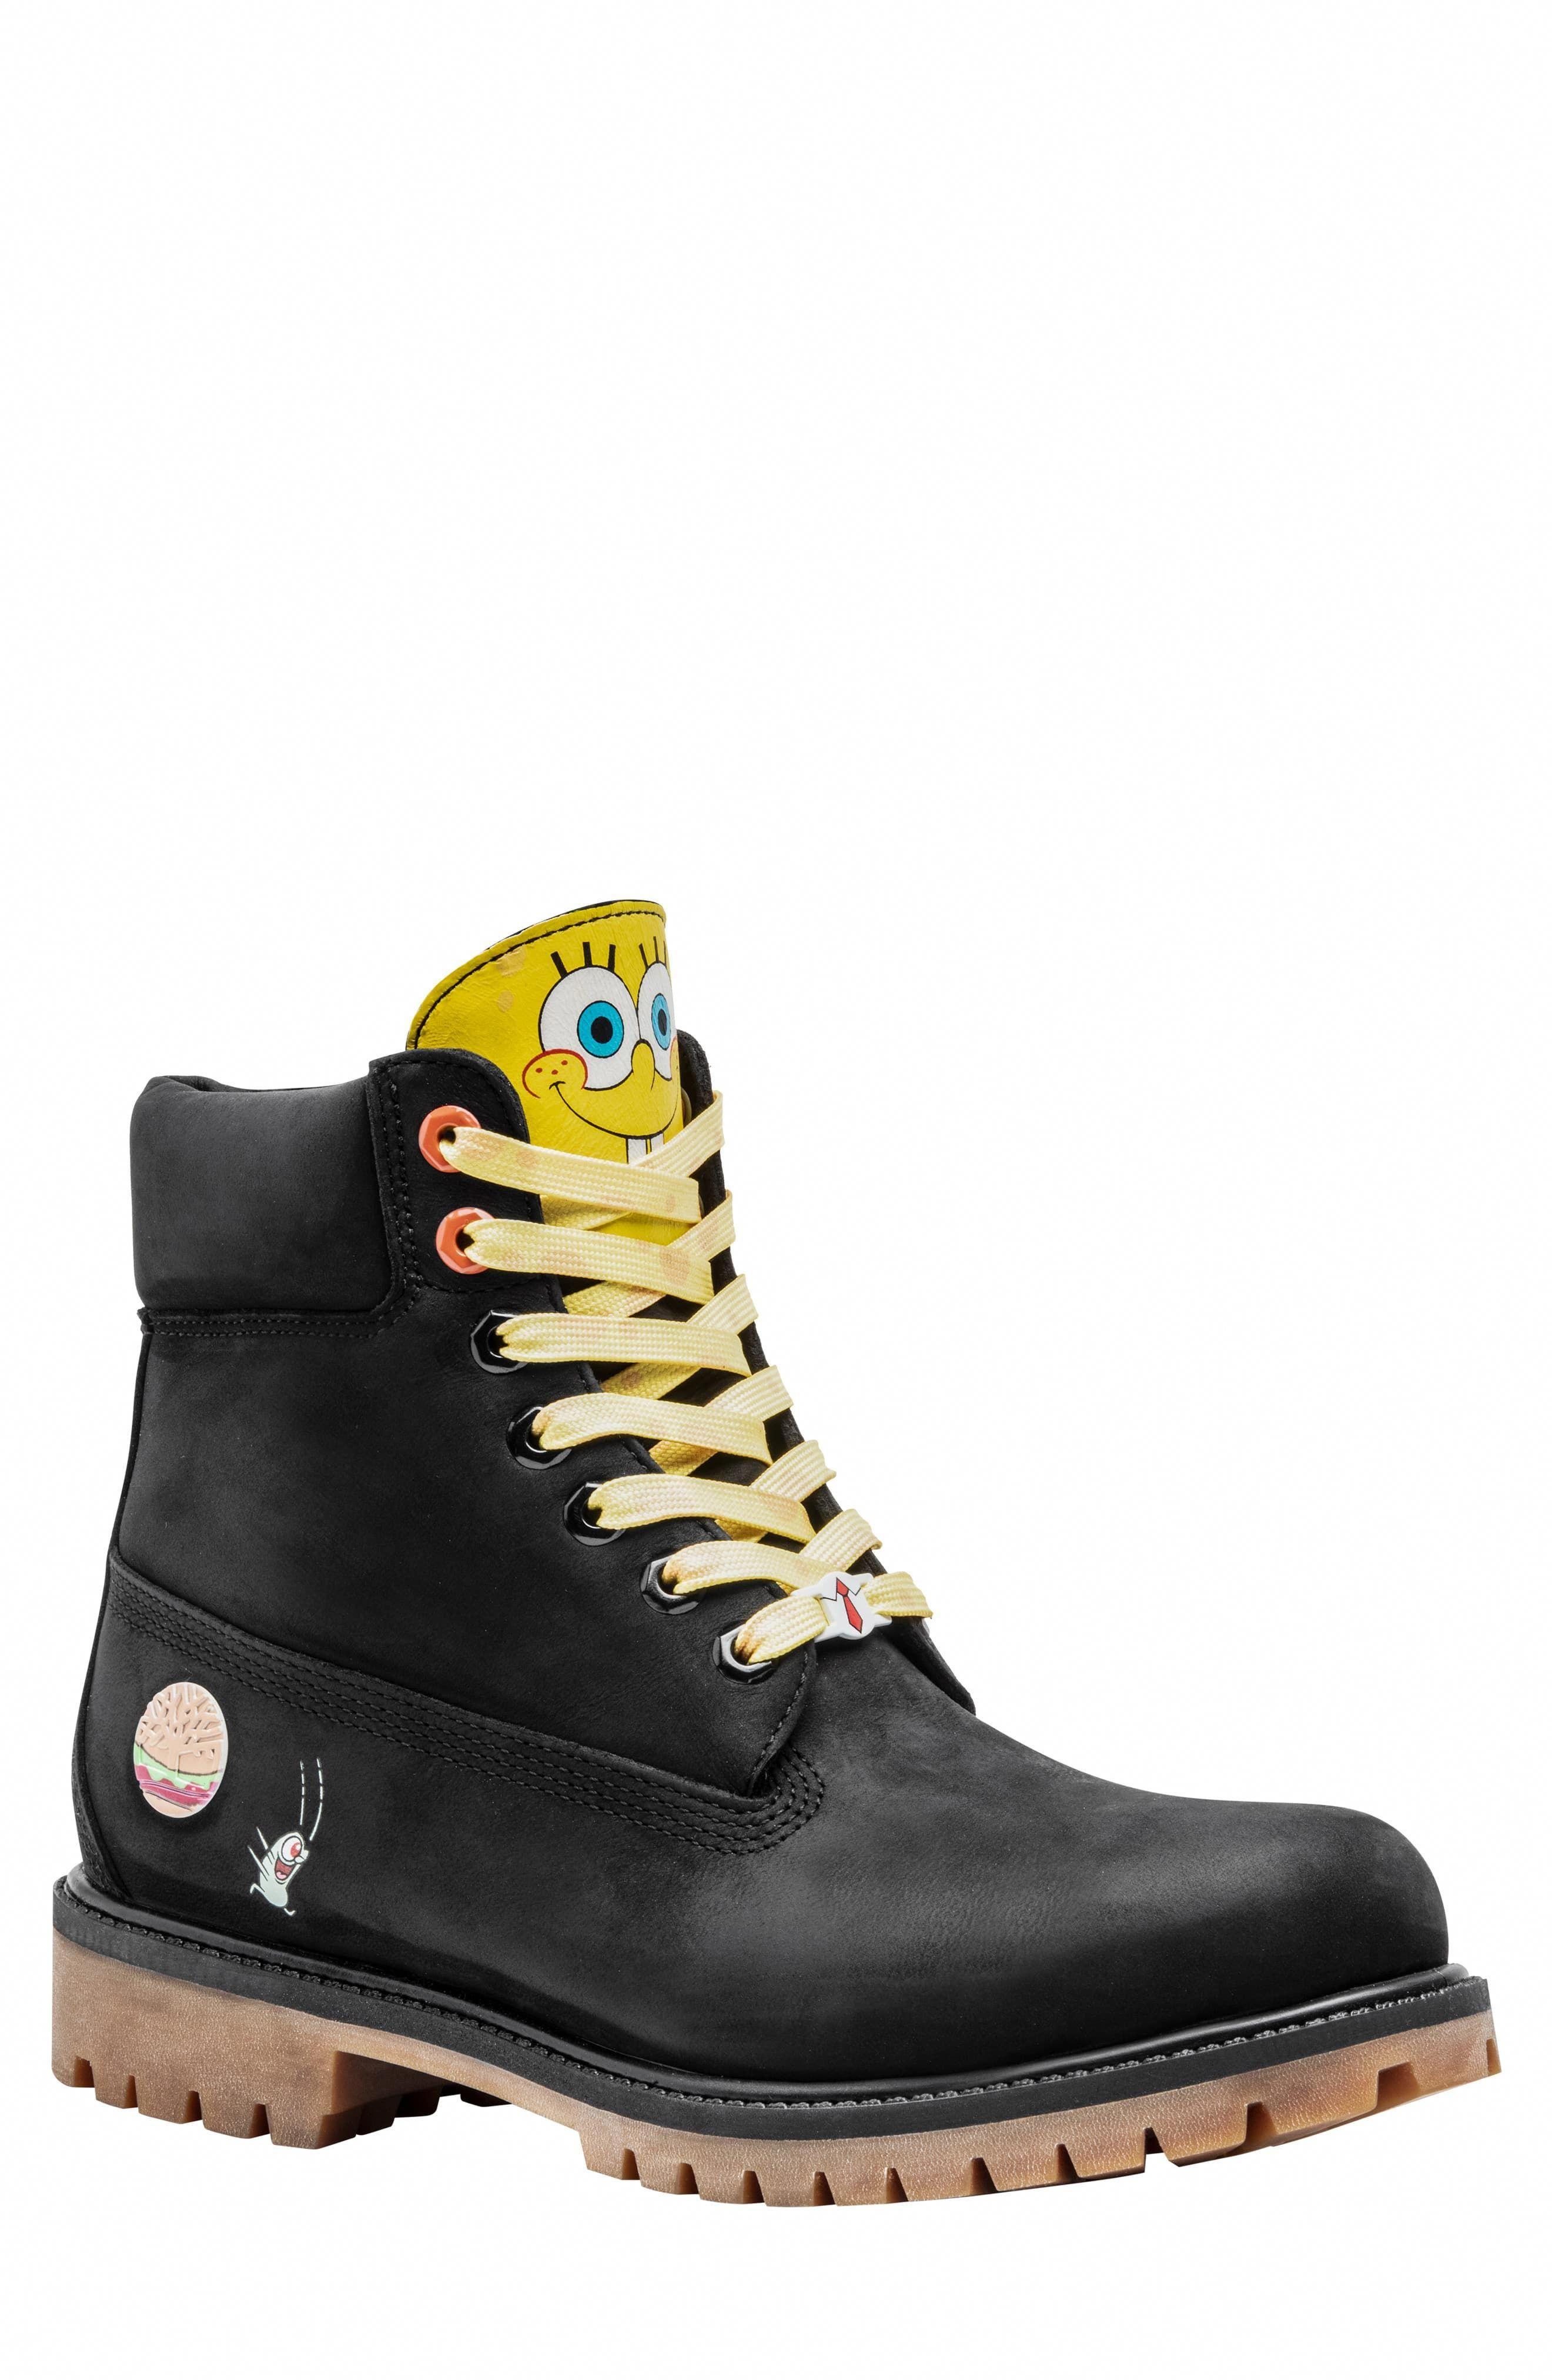 Spongebob Timberlands : spongebob, timberlands, Men's, Timberland, Spongebob, Waterproof, Plain, Boot,, Black, #timberlandbootsoutfitmens, Boots, Outfit, Mens,, Boots,